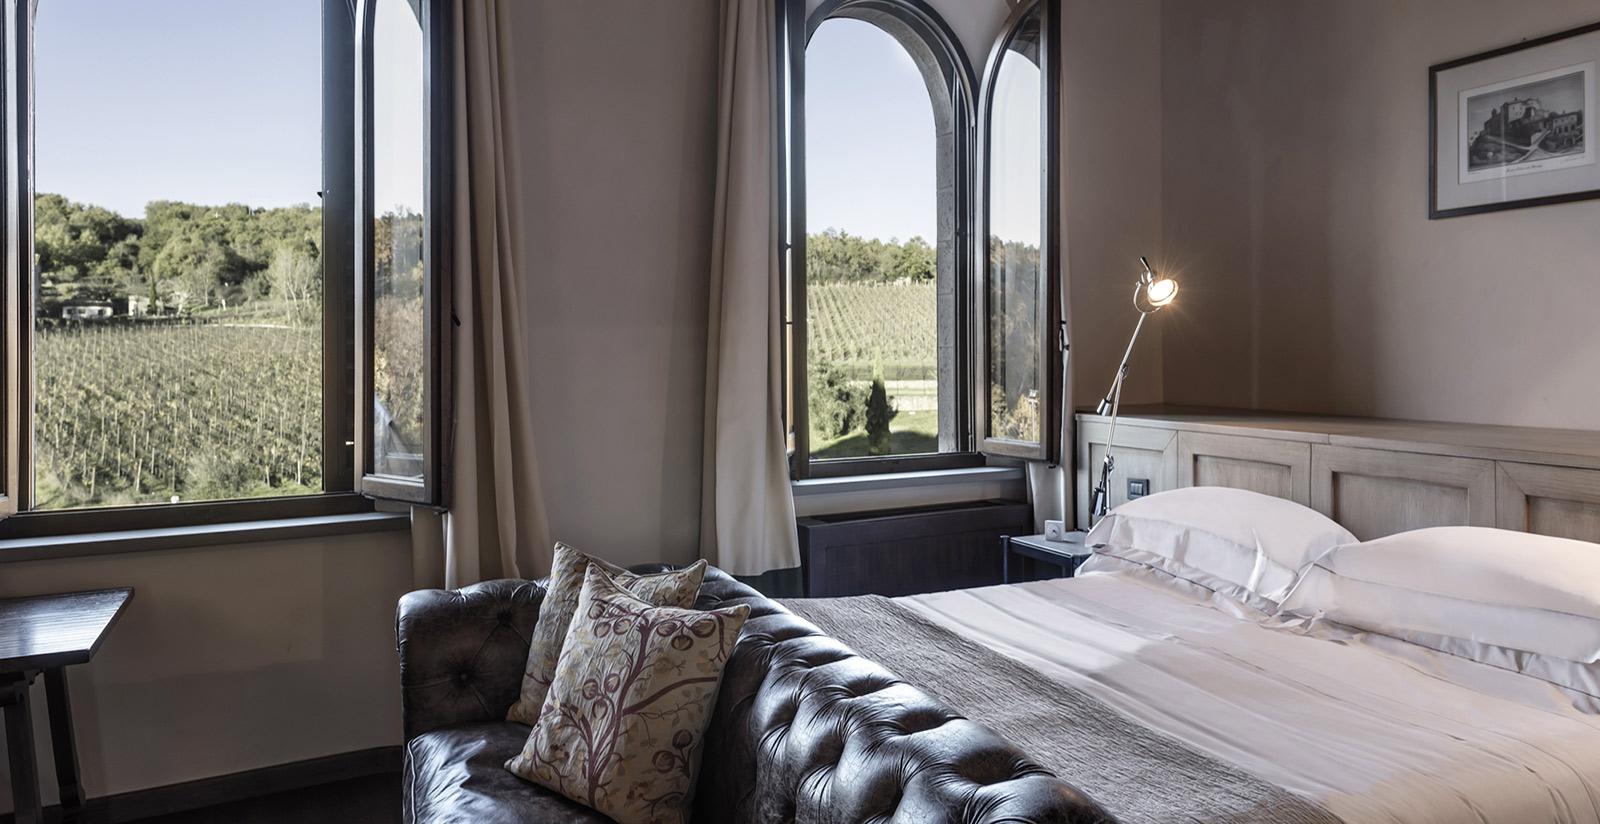 Castel Monastero Resort Privacy Policy